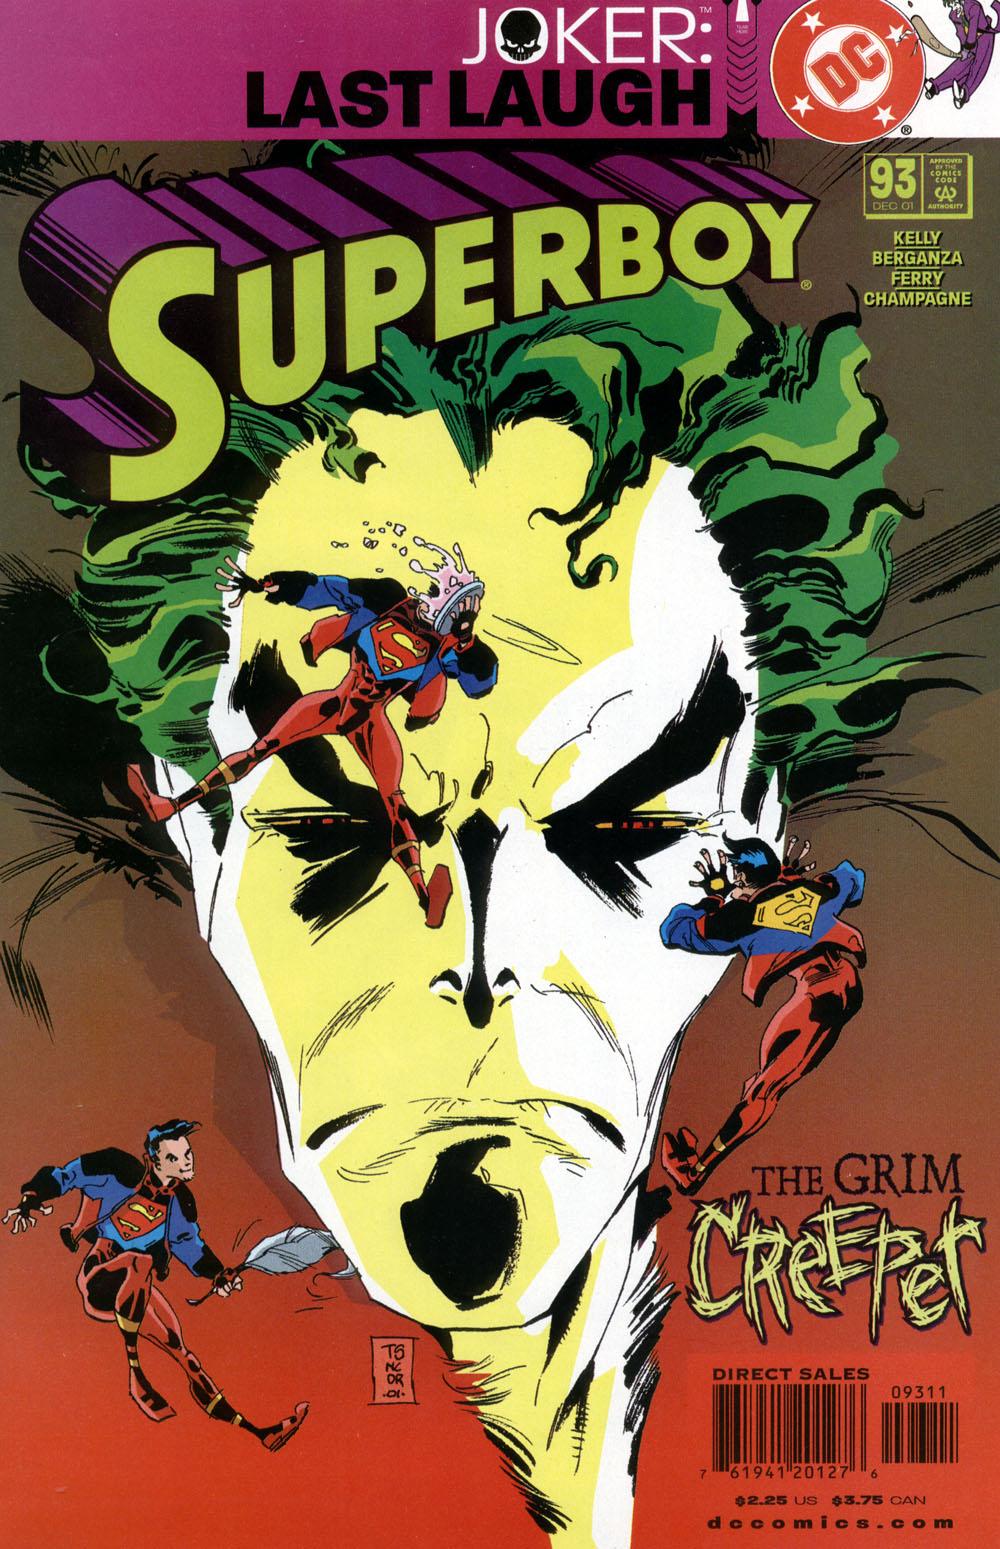 Superboy v3 93 - 00.jpg